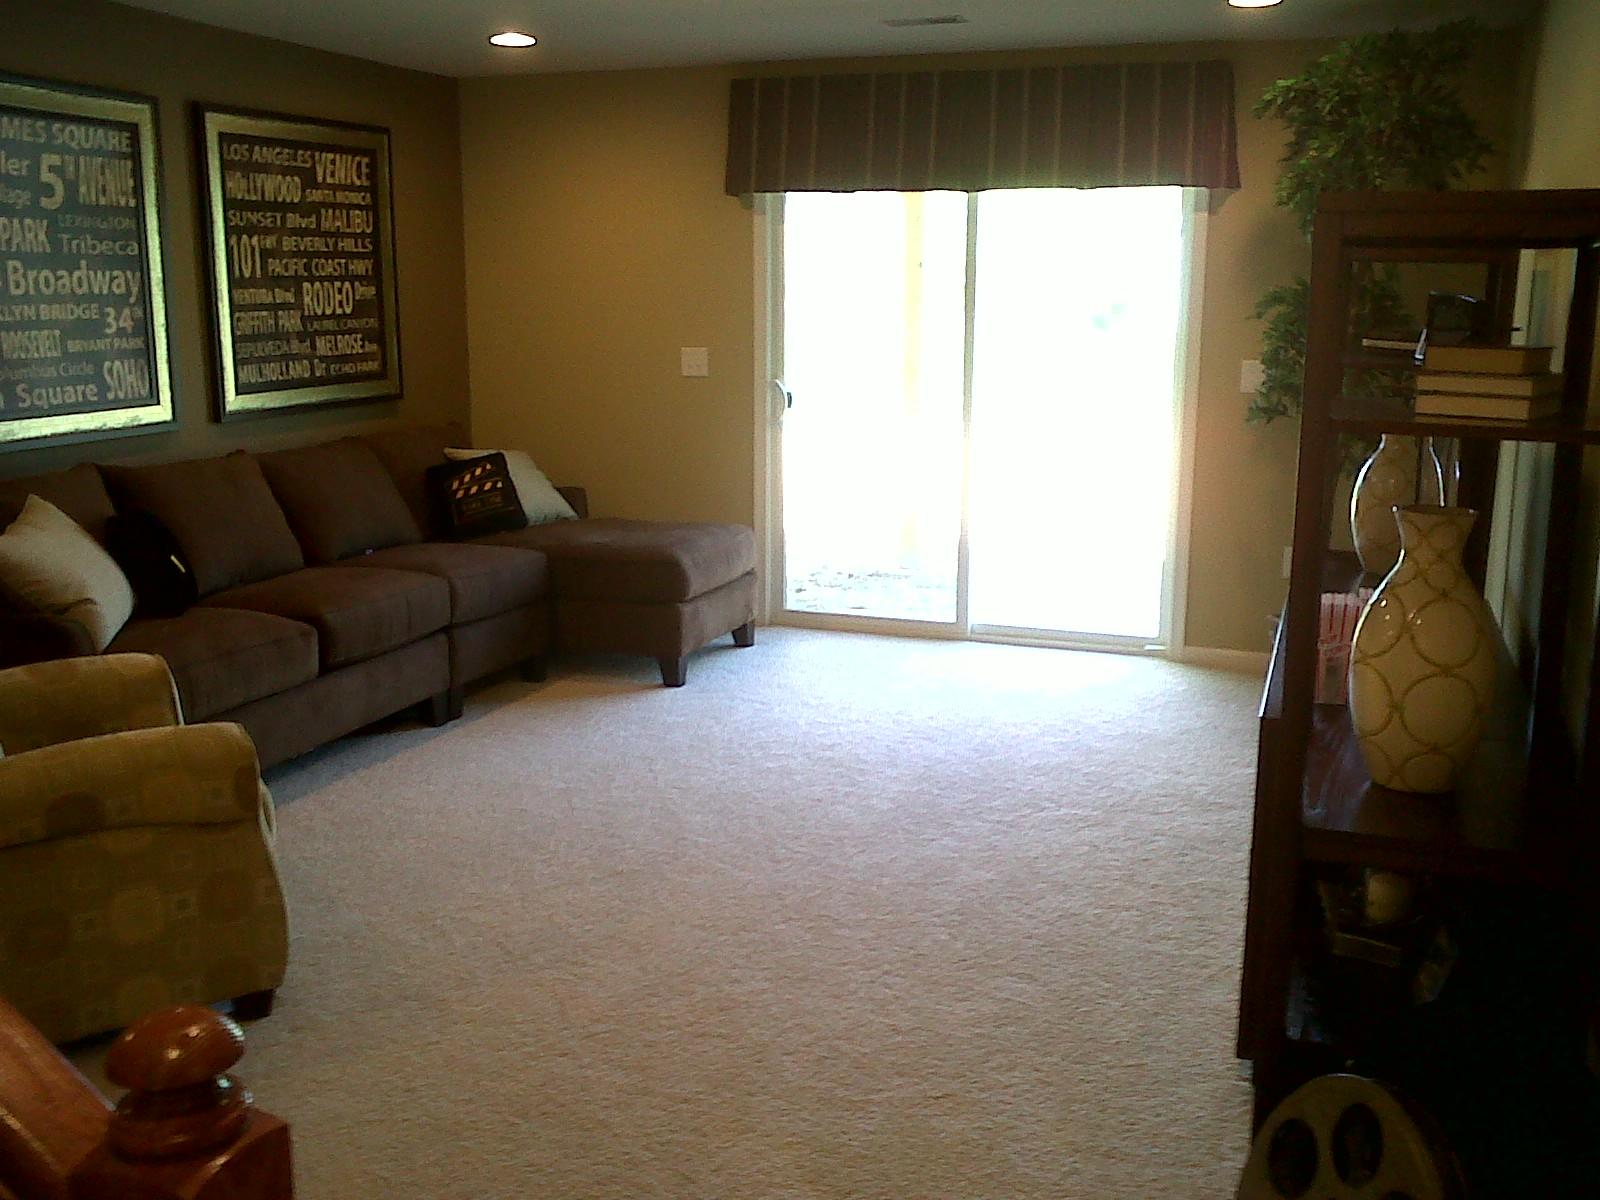 basement 1 basement 2 guest room 1 guest room 2 coat closet dining we title=